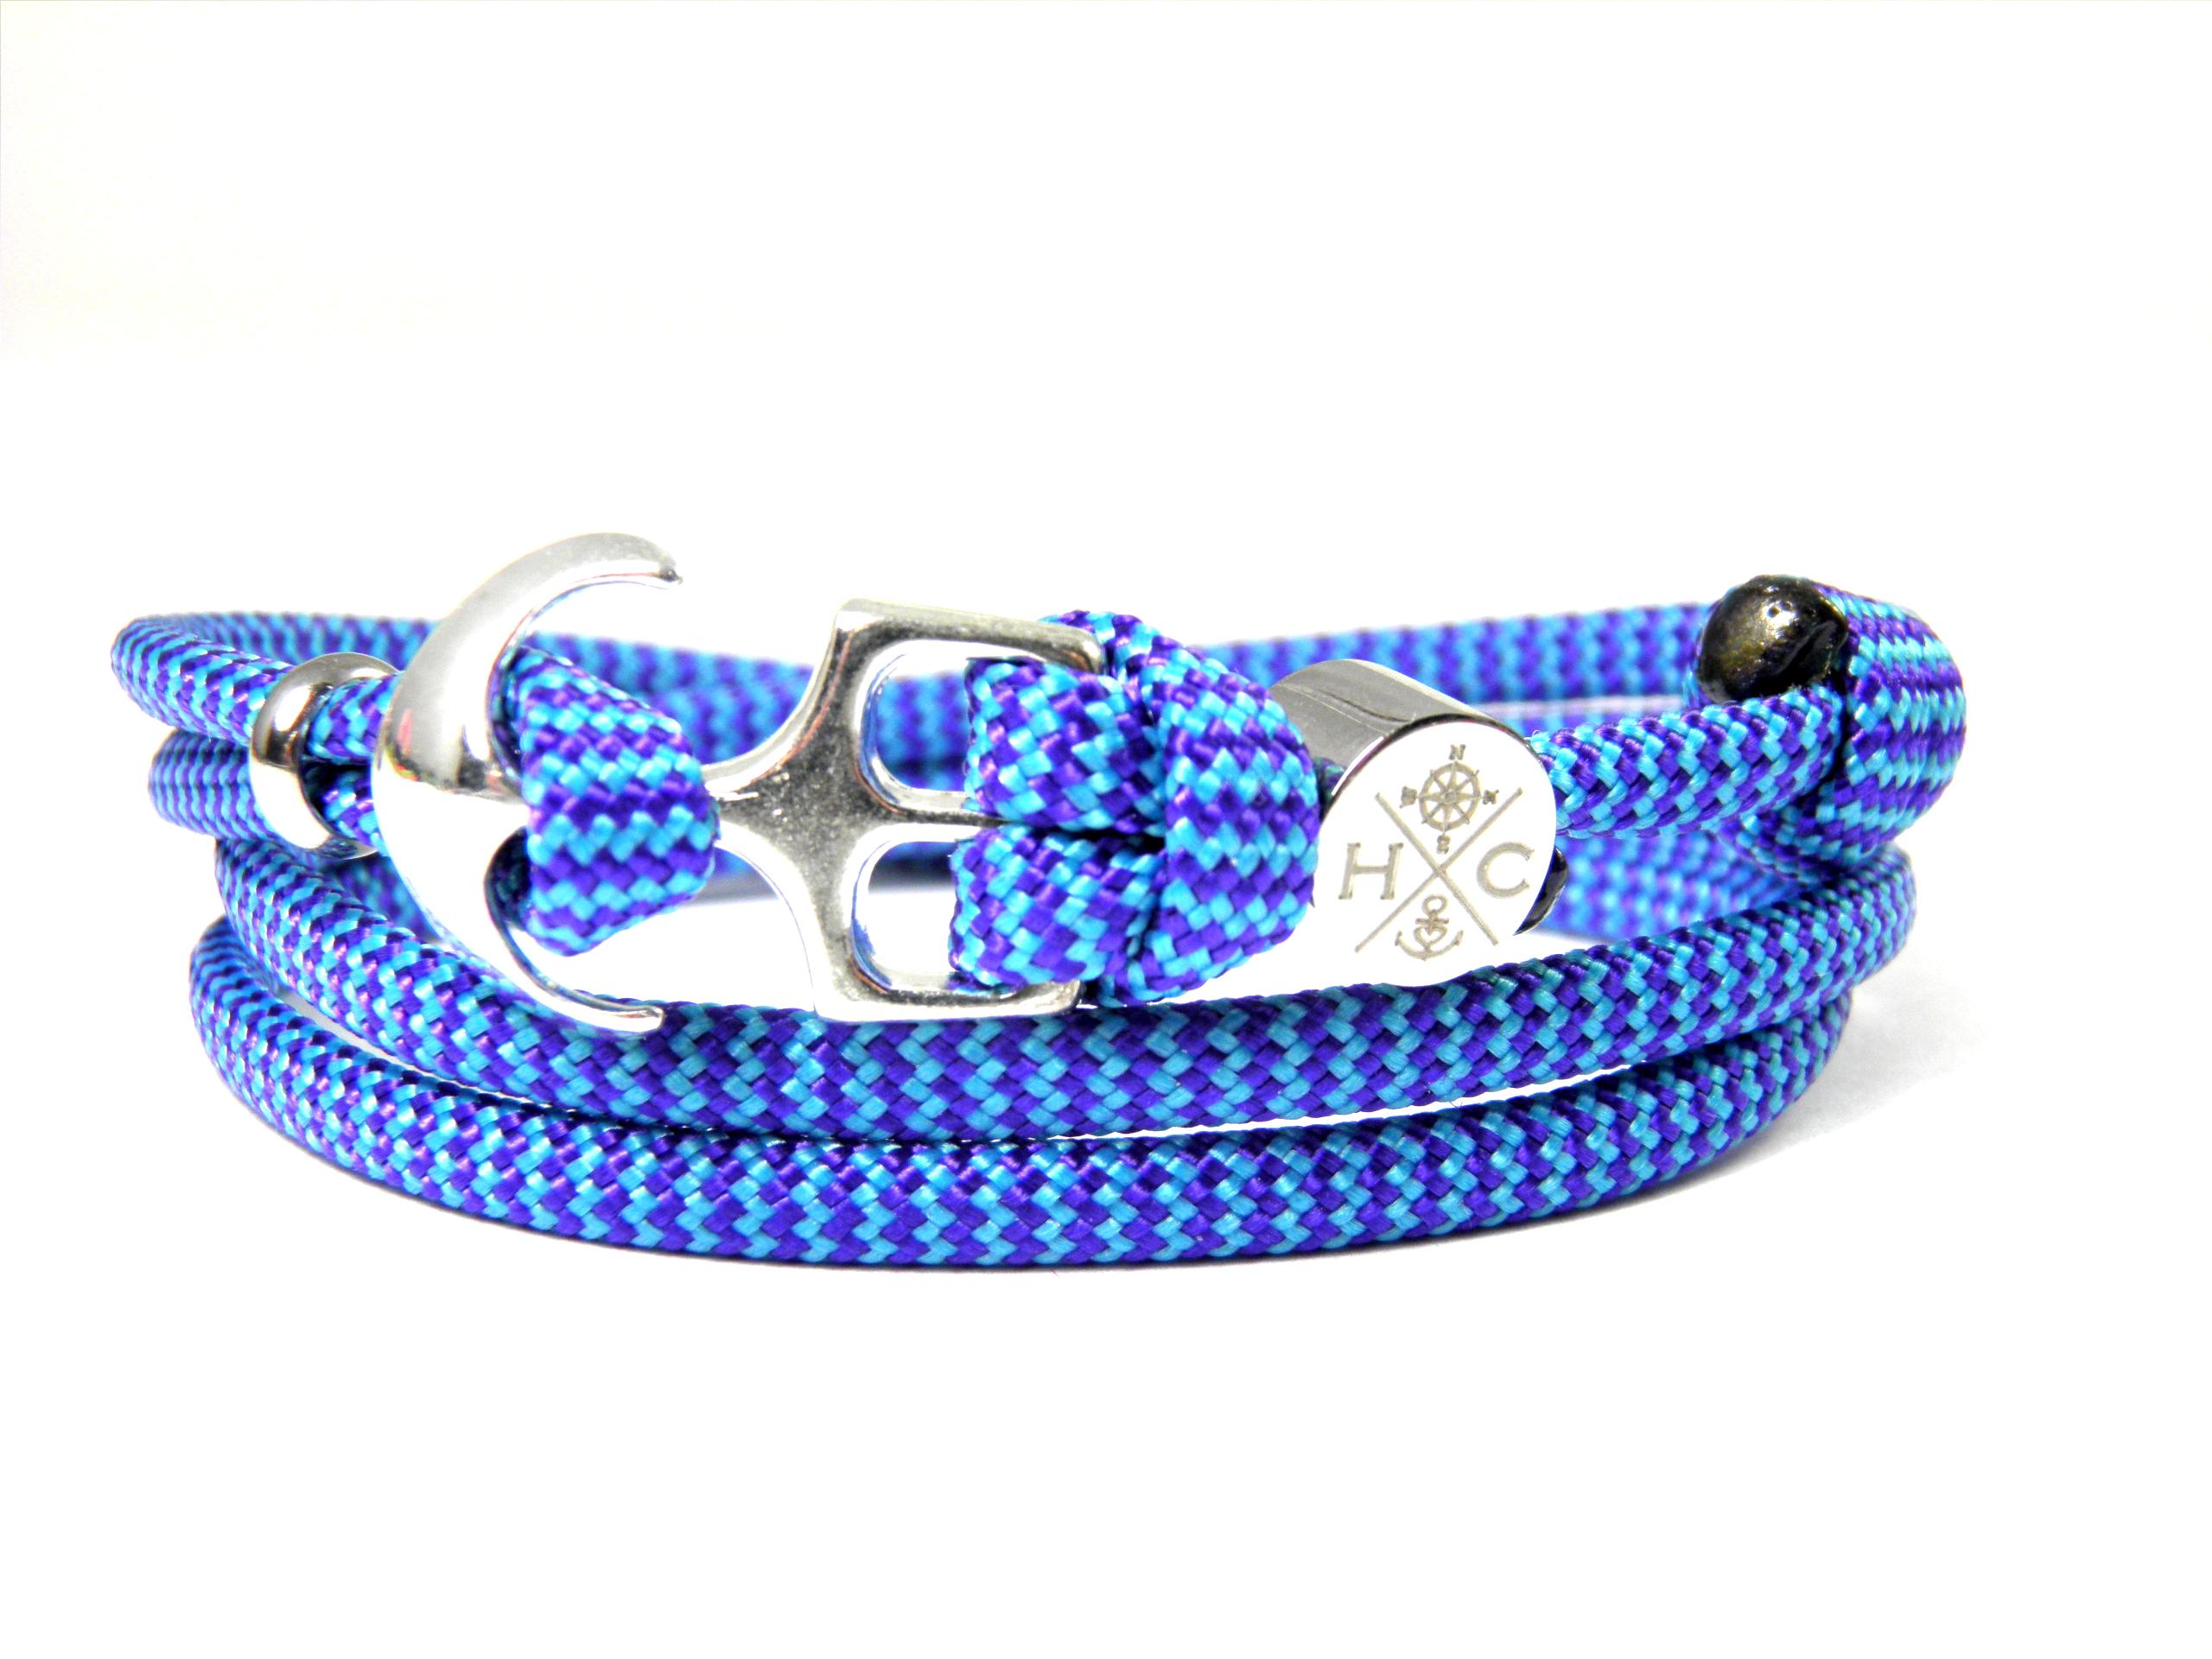 Edelstahl Anker Armband-Maritim aus US Paracord III-Wickelarmband-verstellbar